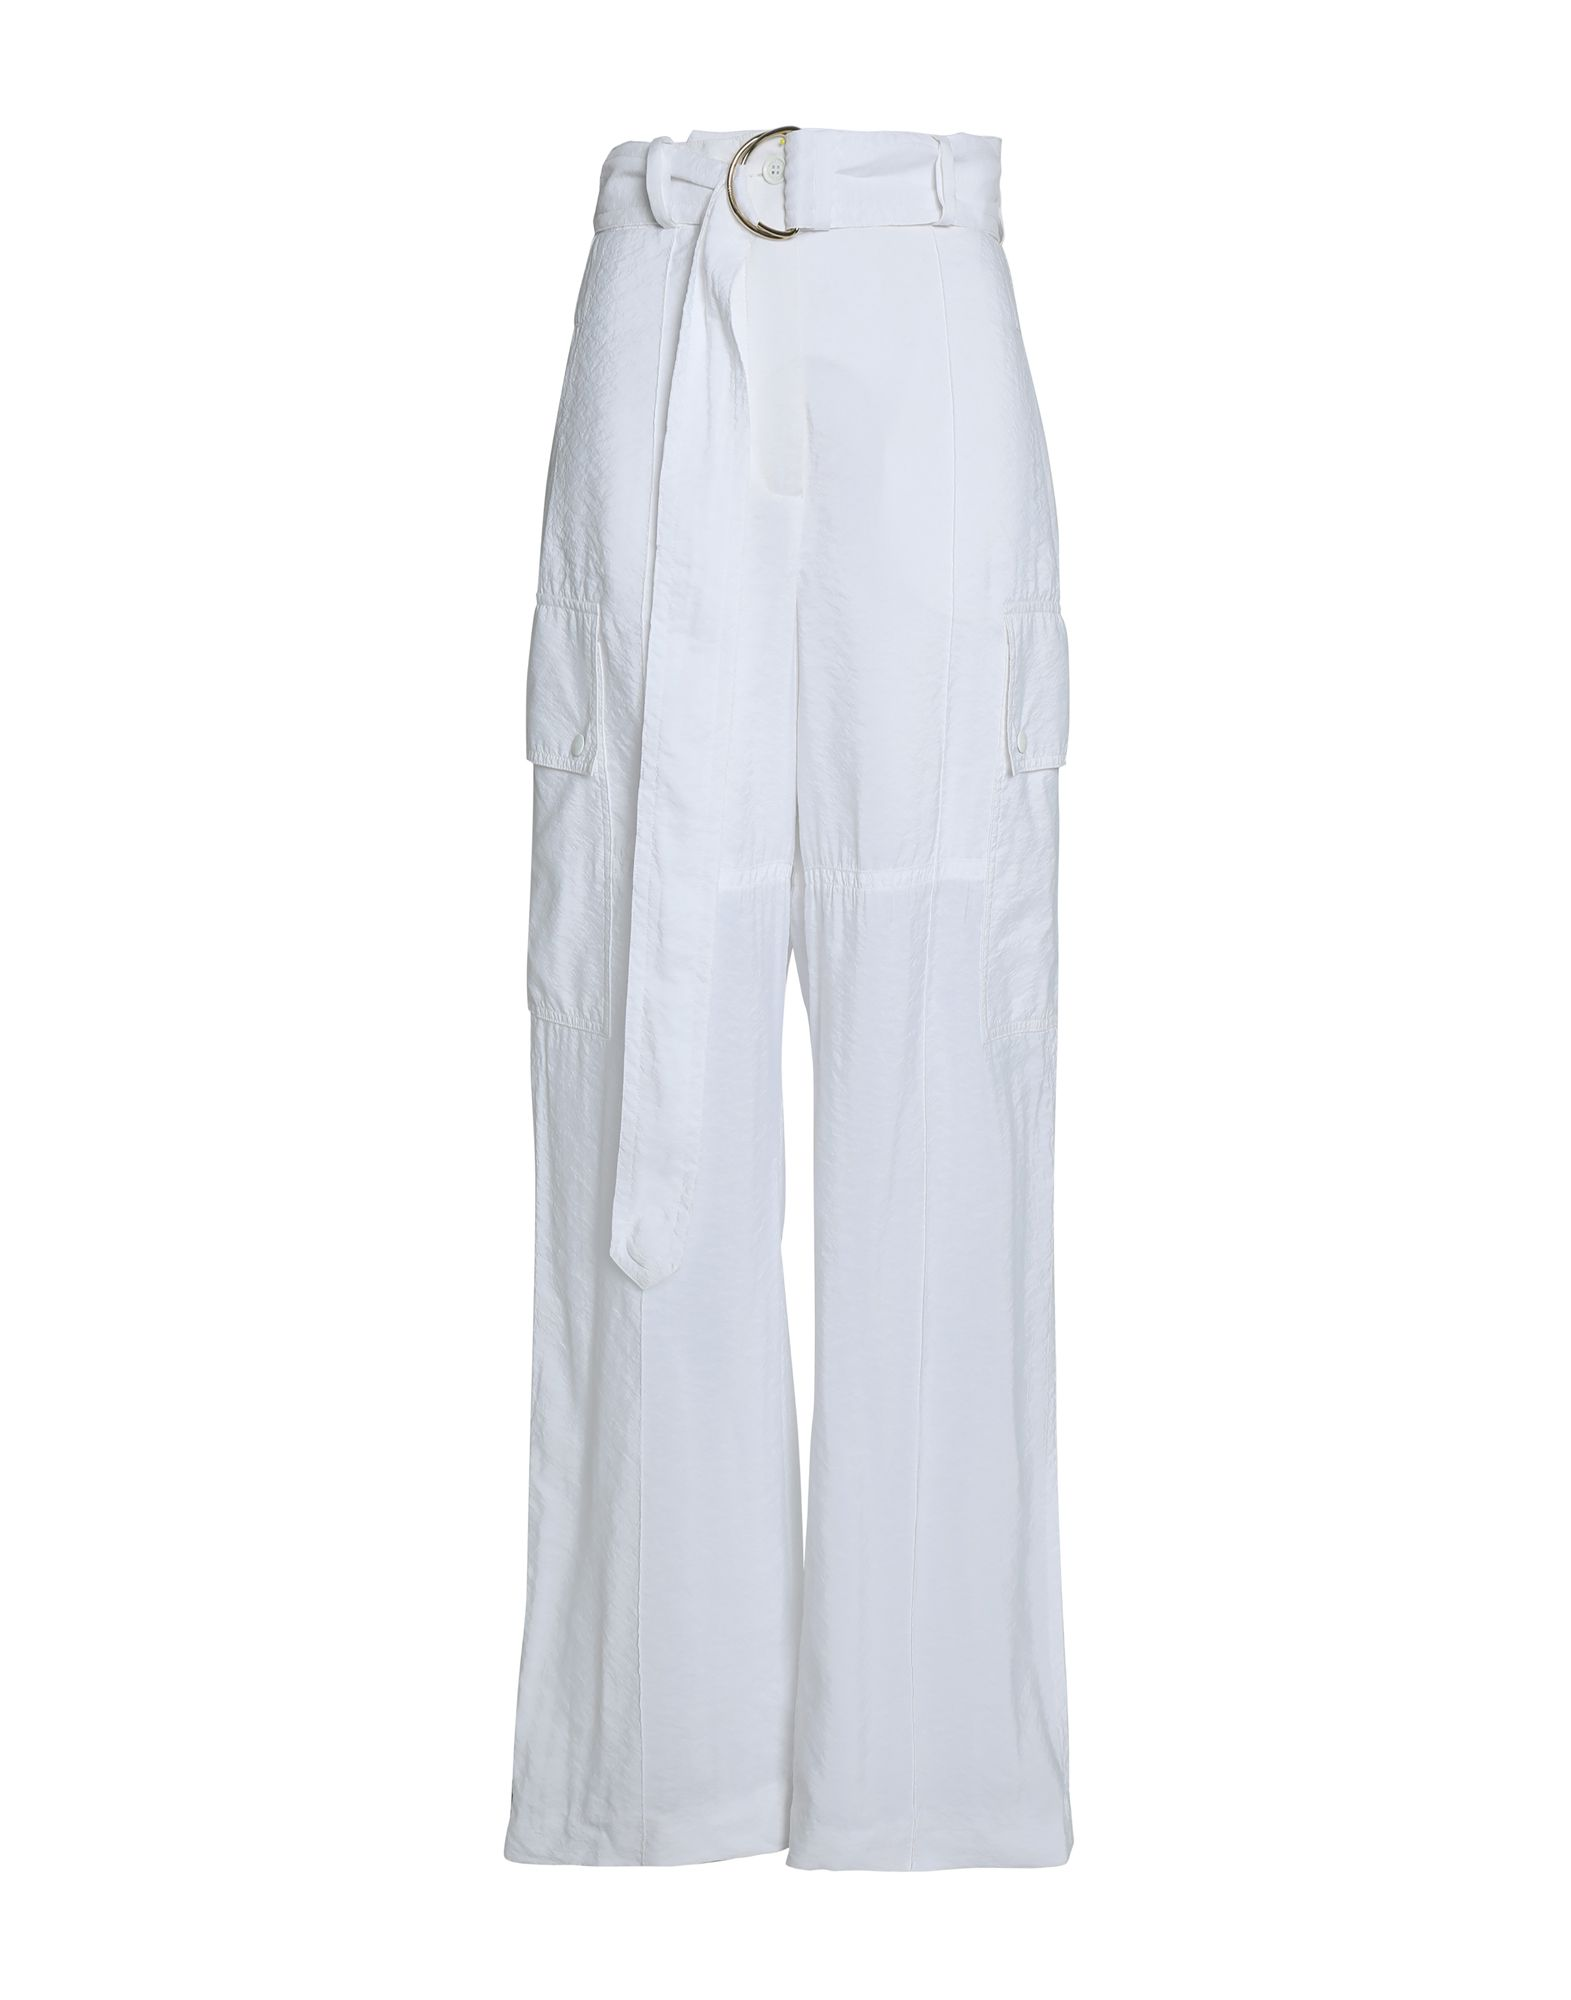 NINA RICCI Повседневные брюки брюки angela ricci